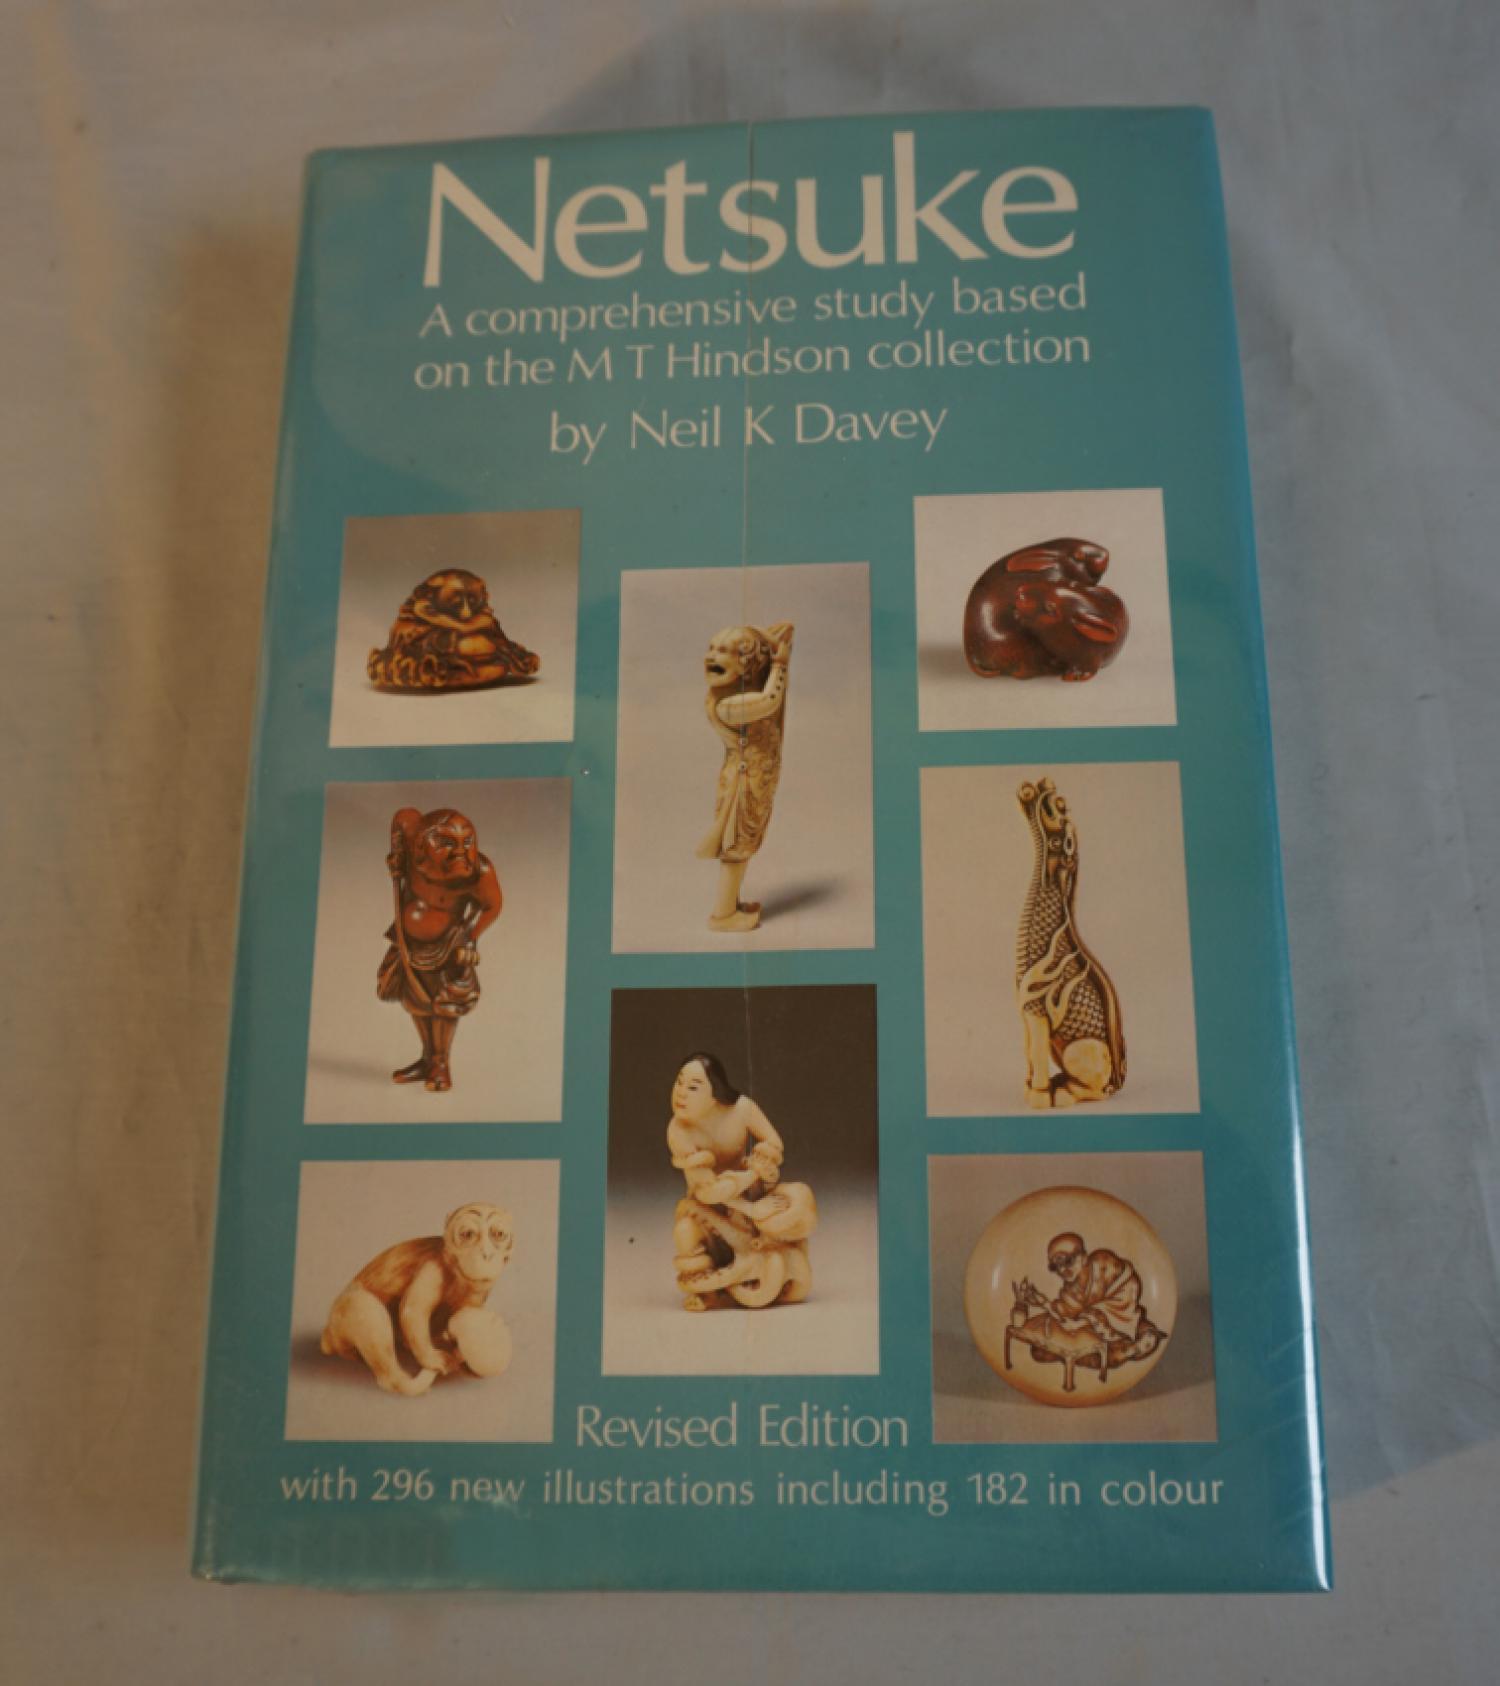 Netsuke by Neil K Davey revised 1982 edition